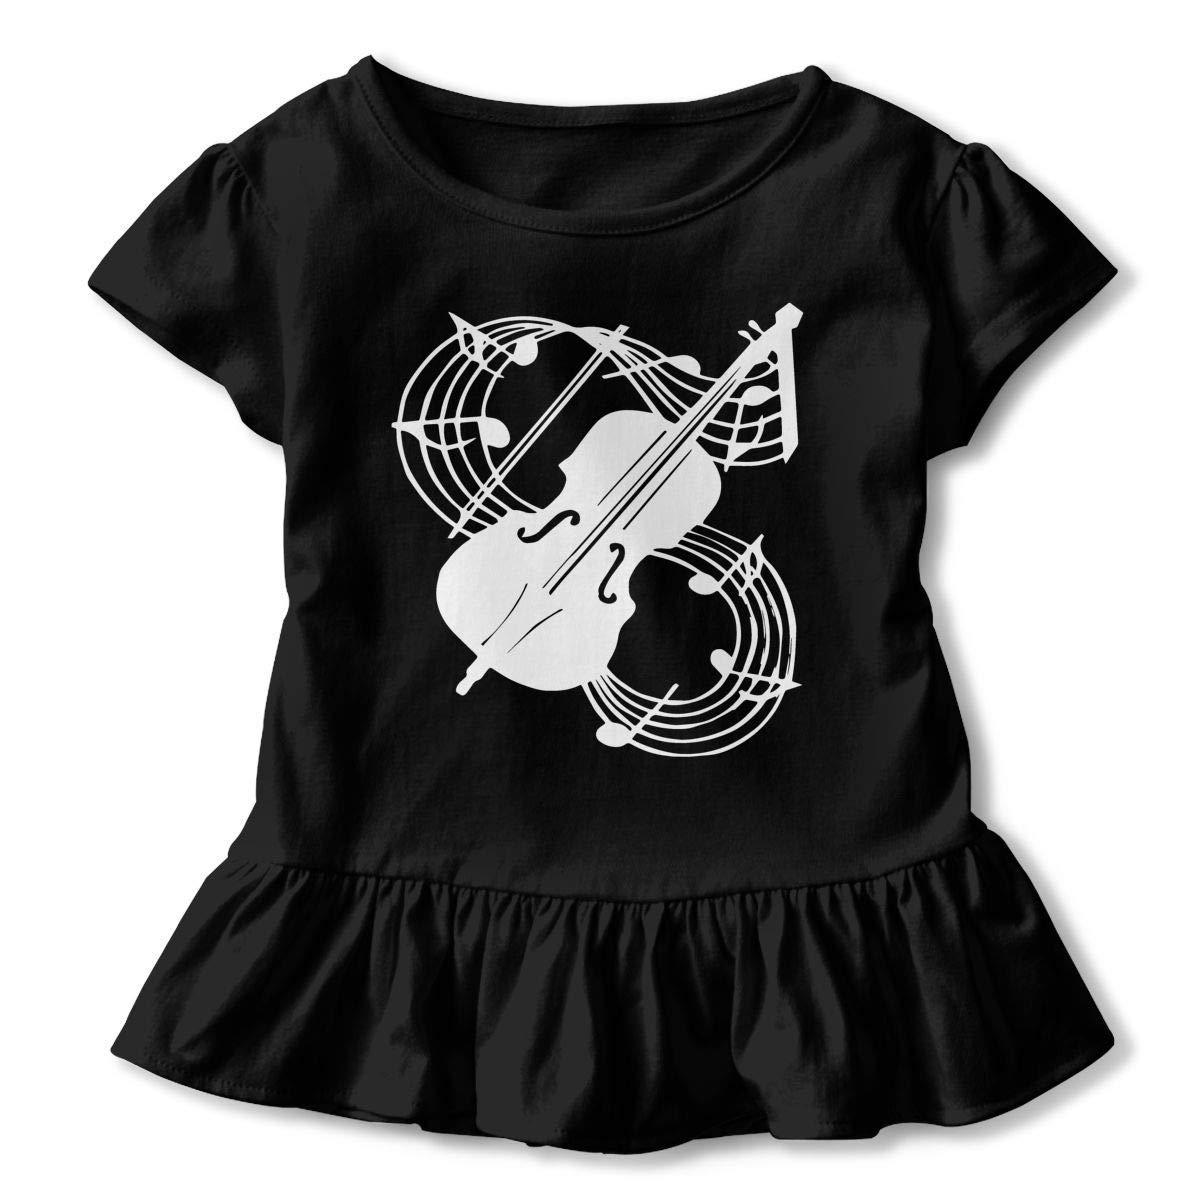 Cute Sweatshirt with Falbala 2-6T Violin T-Shirts for Girls PMsunglasses Short Sleeve Musical Note